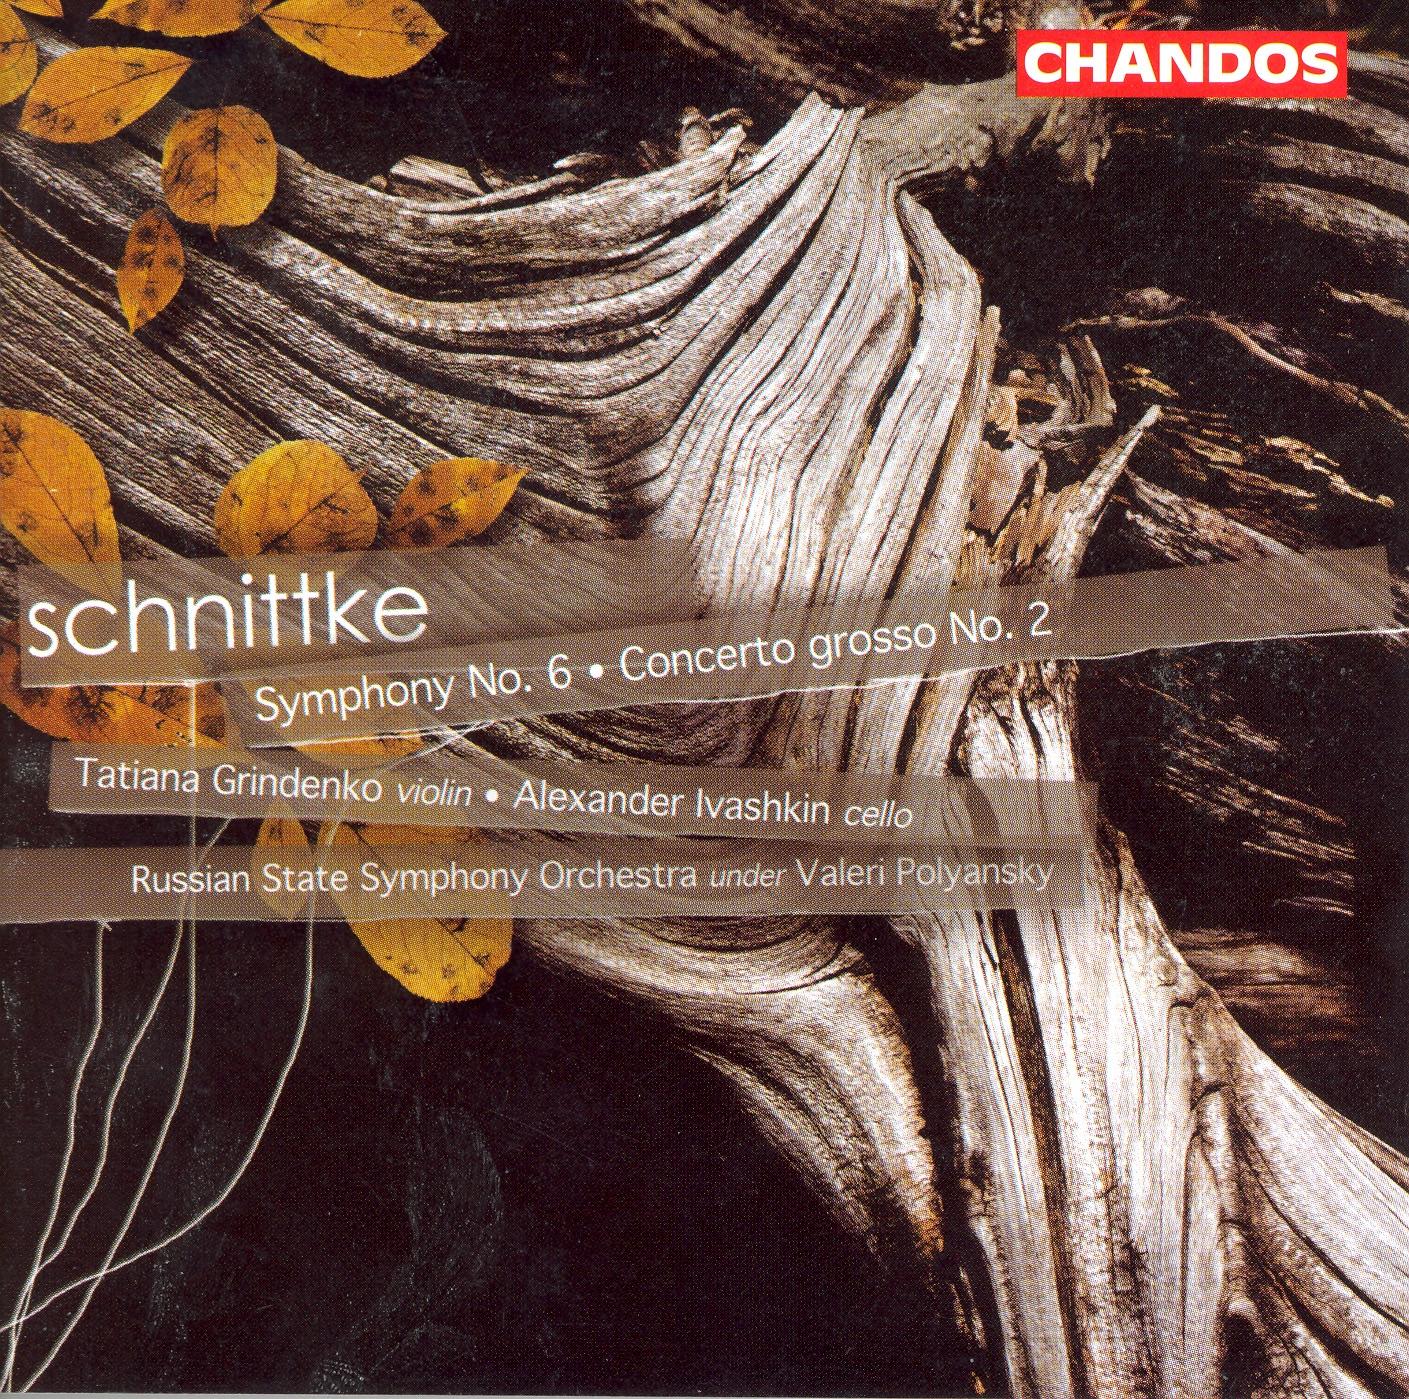 Concerto Grosso No. 2: III. Allegro